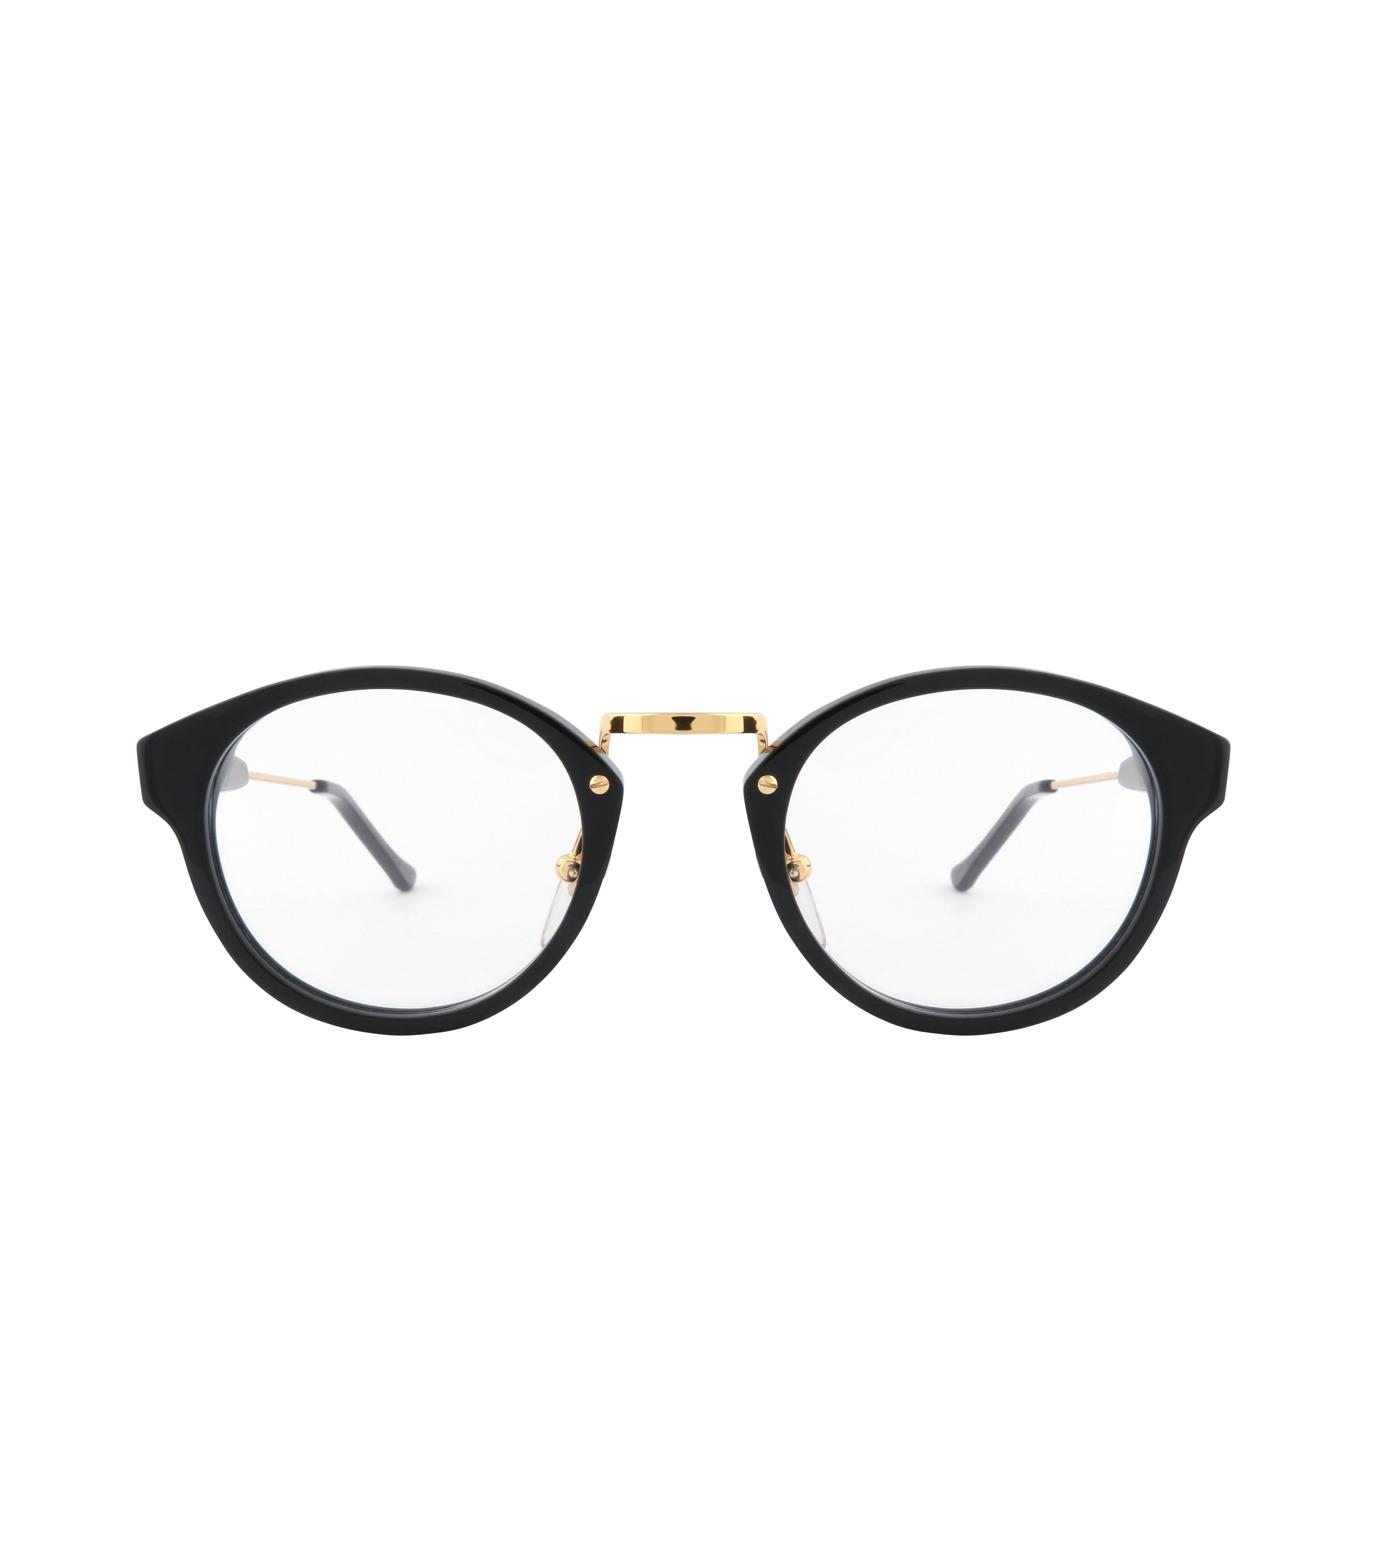 SUPER(スーパー)のPANAMA BLACK CLEAR LENS-BLACK(アイウェア/eyewear)-SPRXXXX054-13 拡大詳細画像3